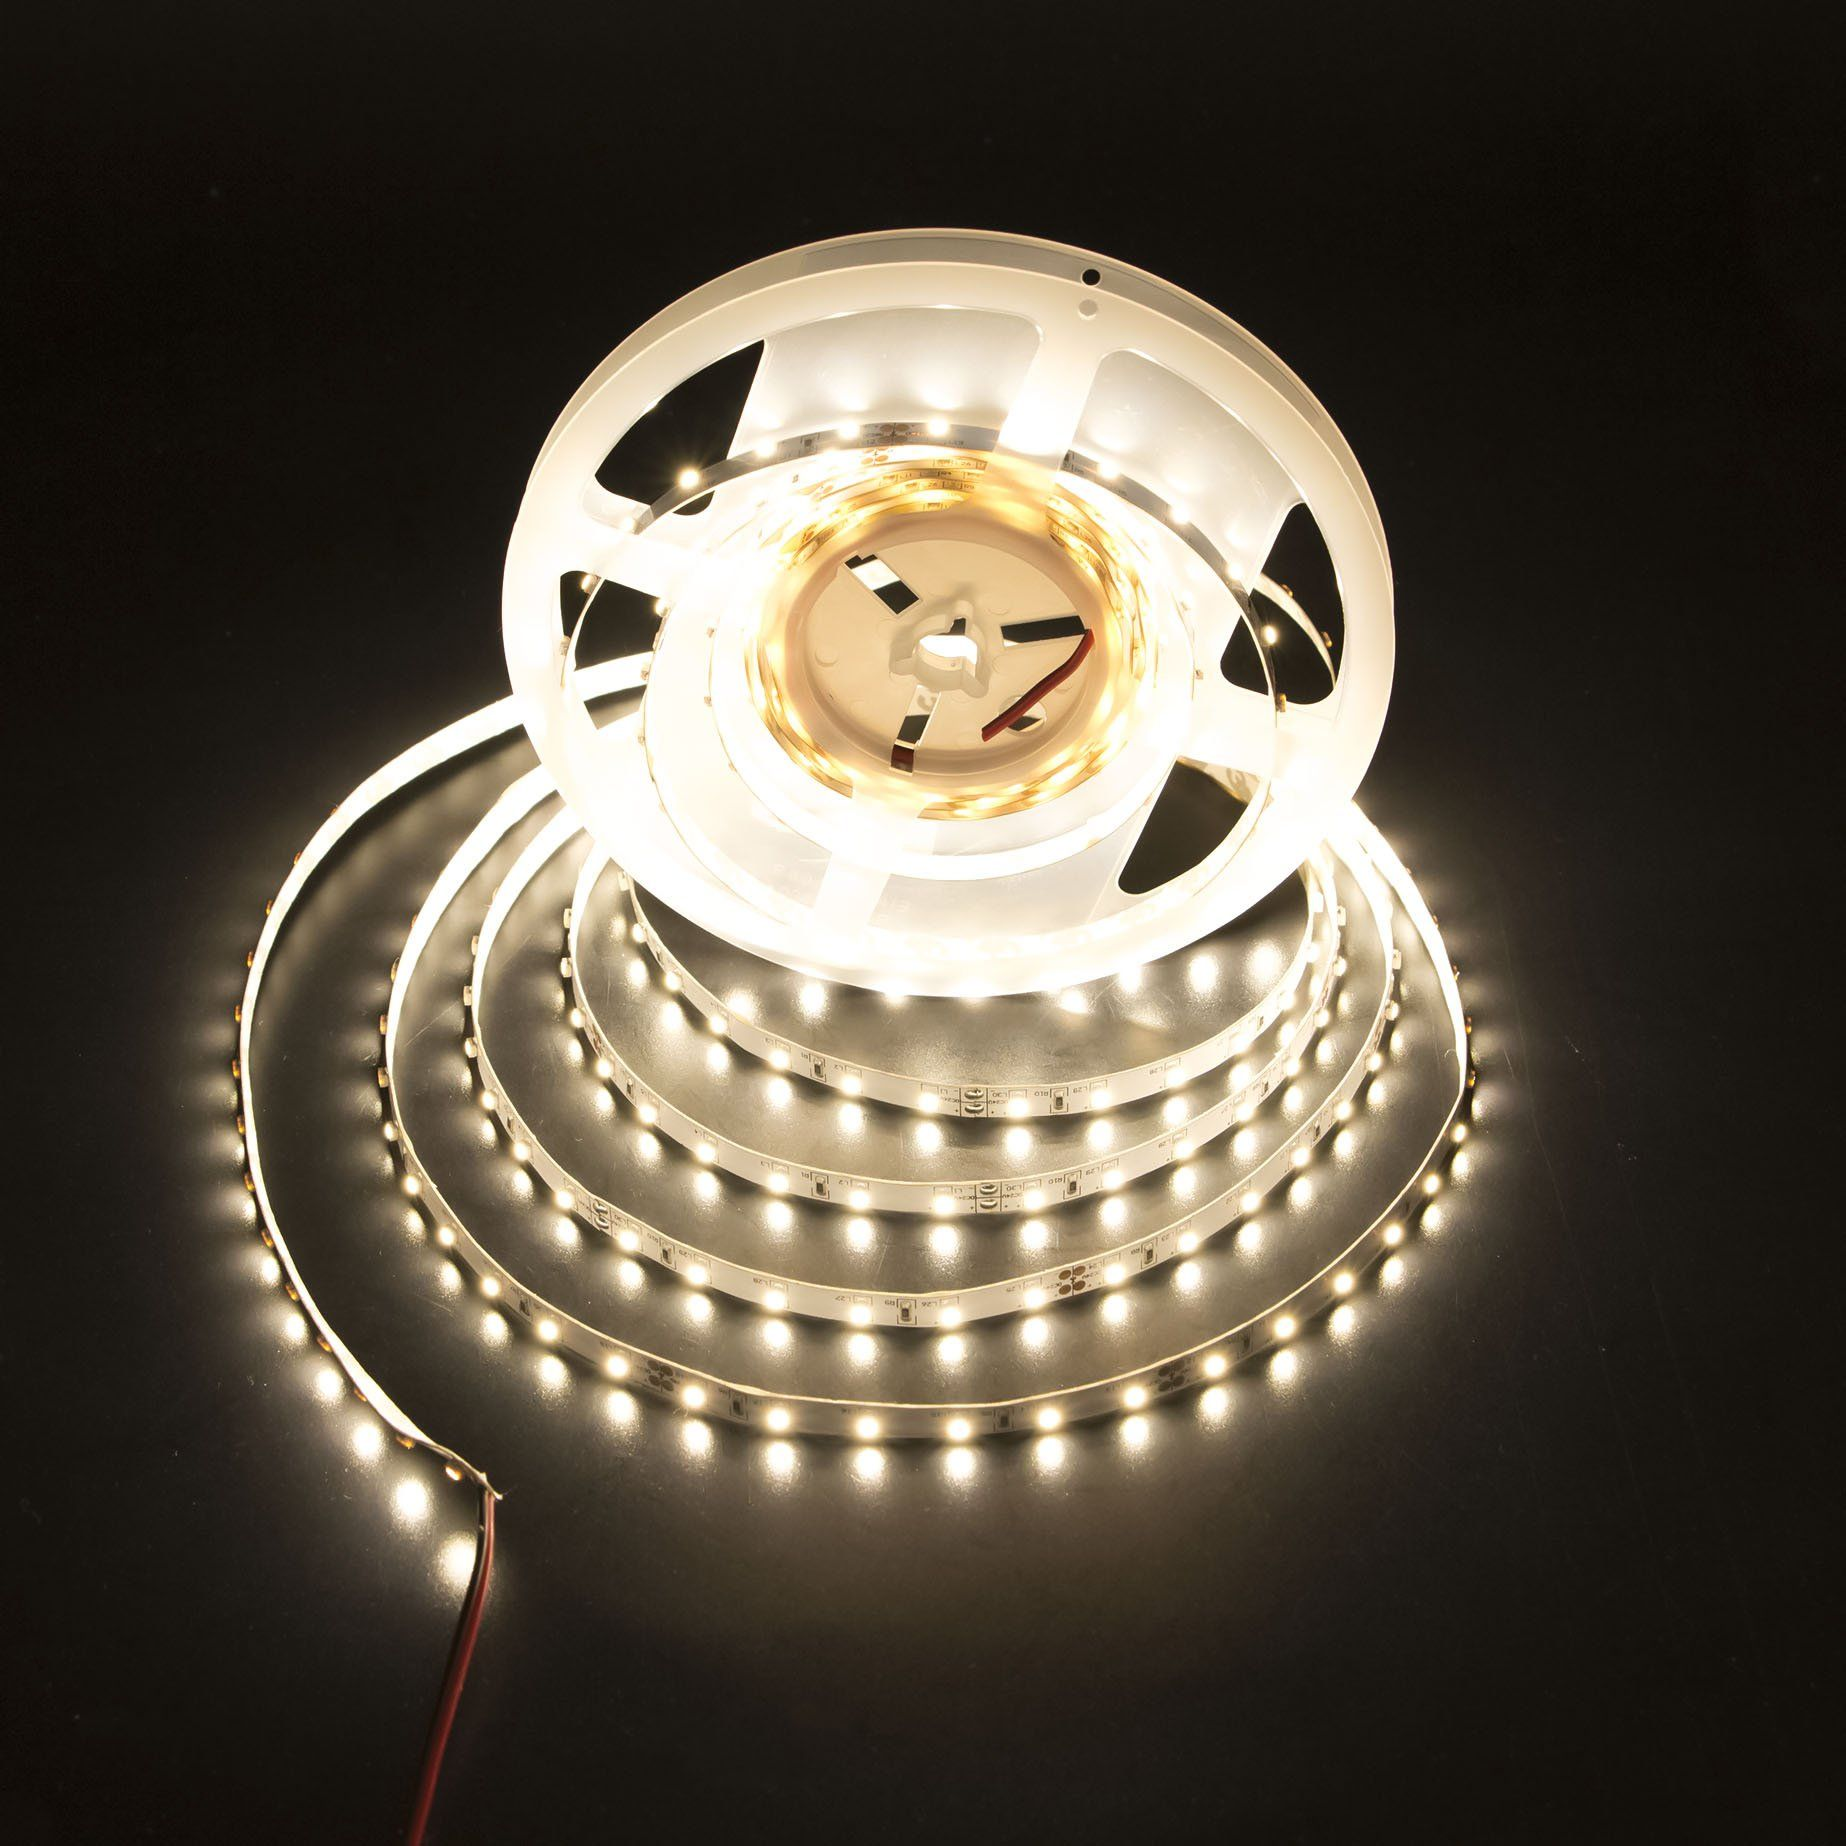 Ledmy Flexible Led Strip Lights Warm White 3000k Dc 12v 24w Smd3528 300leds Ip20 Not Waterproof Led Tape Lighting Flexible Led Strip Lights Led Strip Lighting